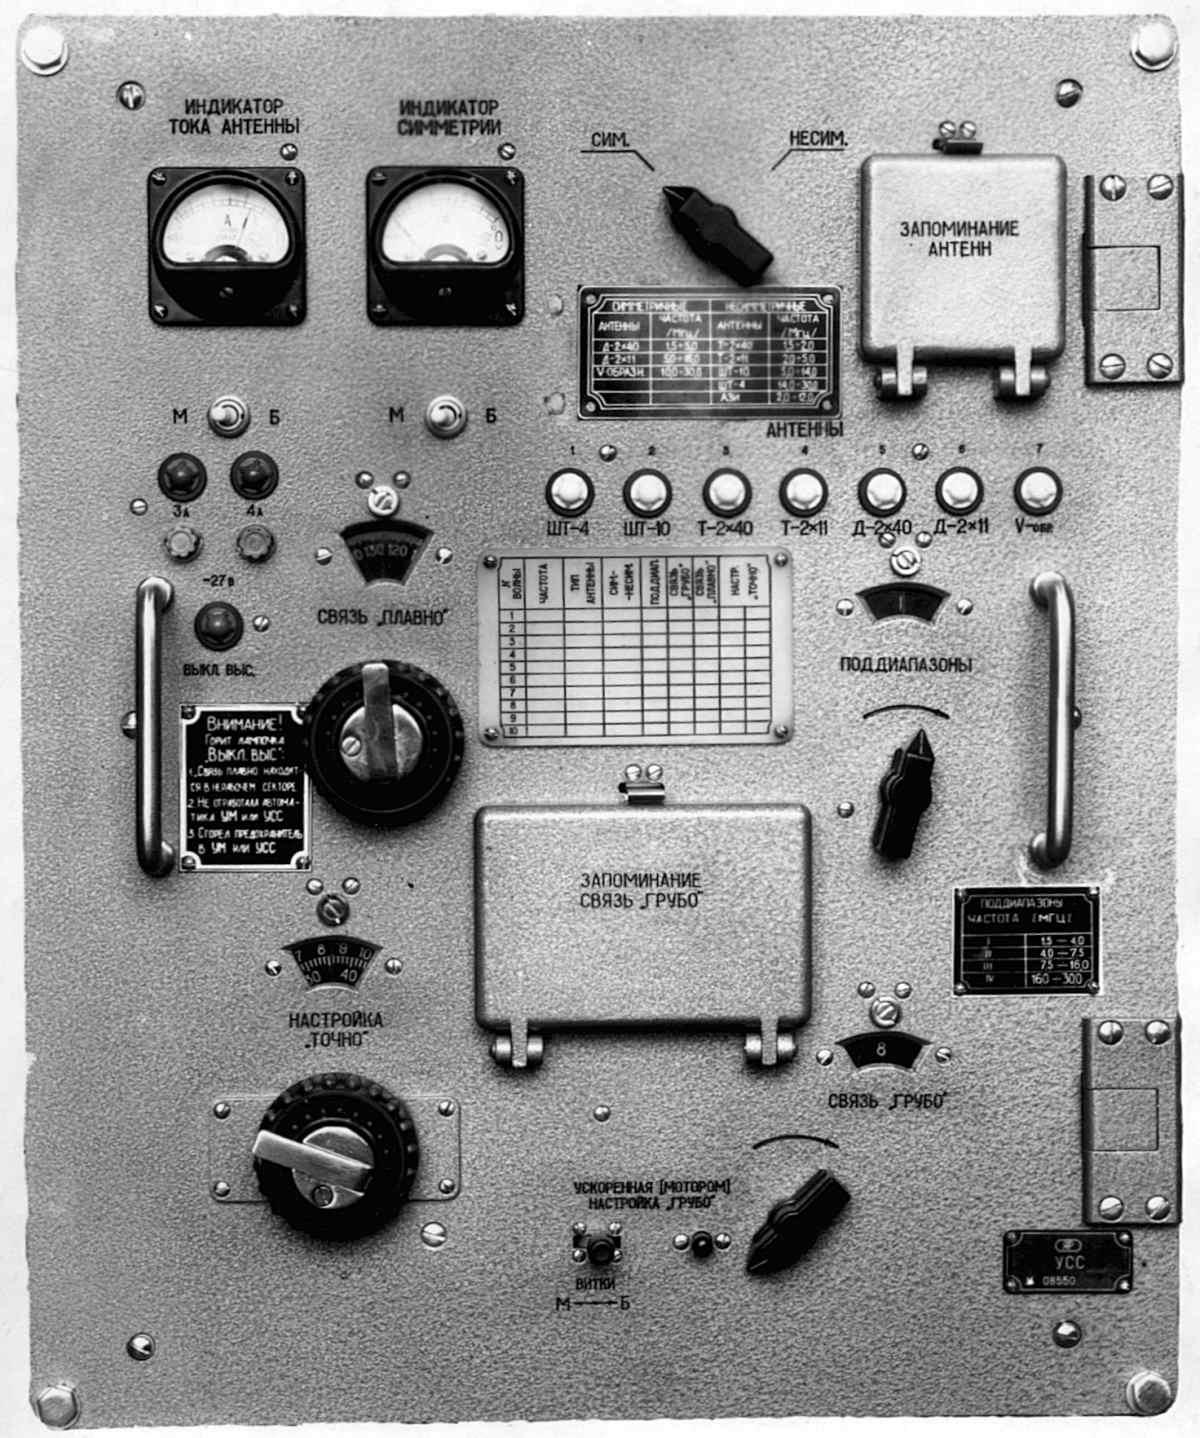 Устройство согласующе-симметрирующее радиостанции типа Р-140 ...